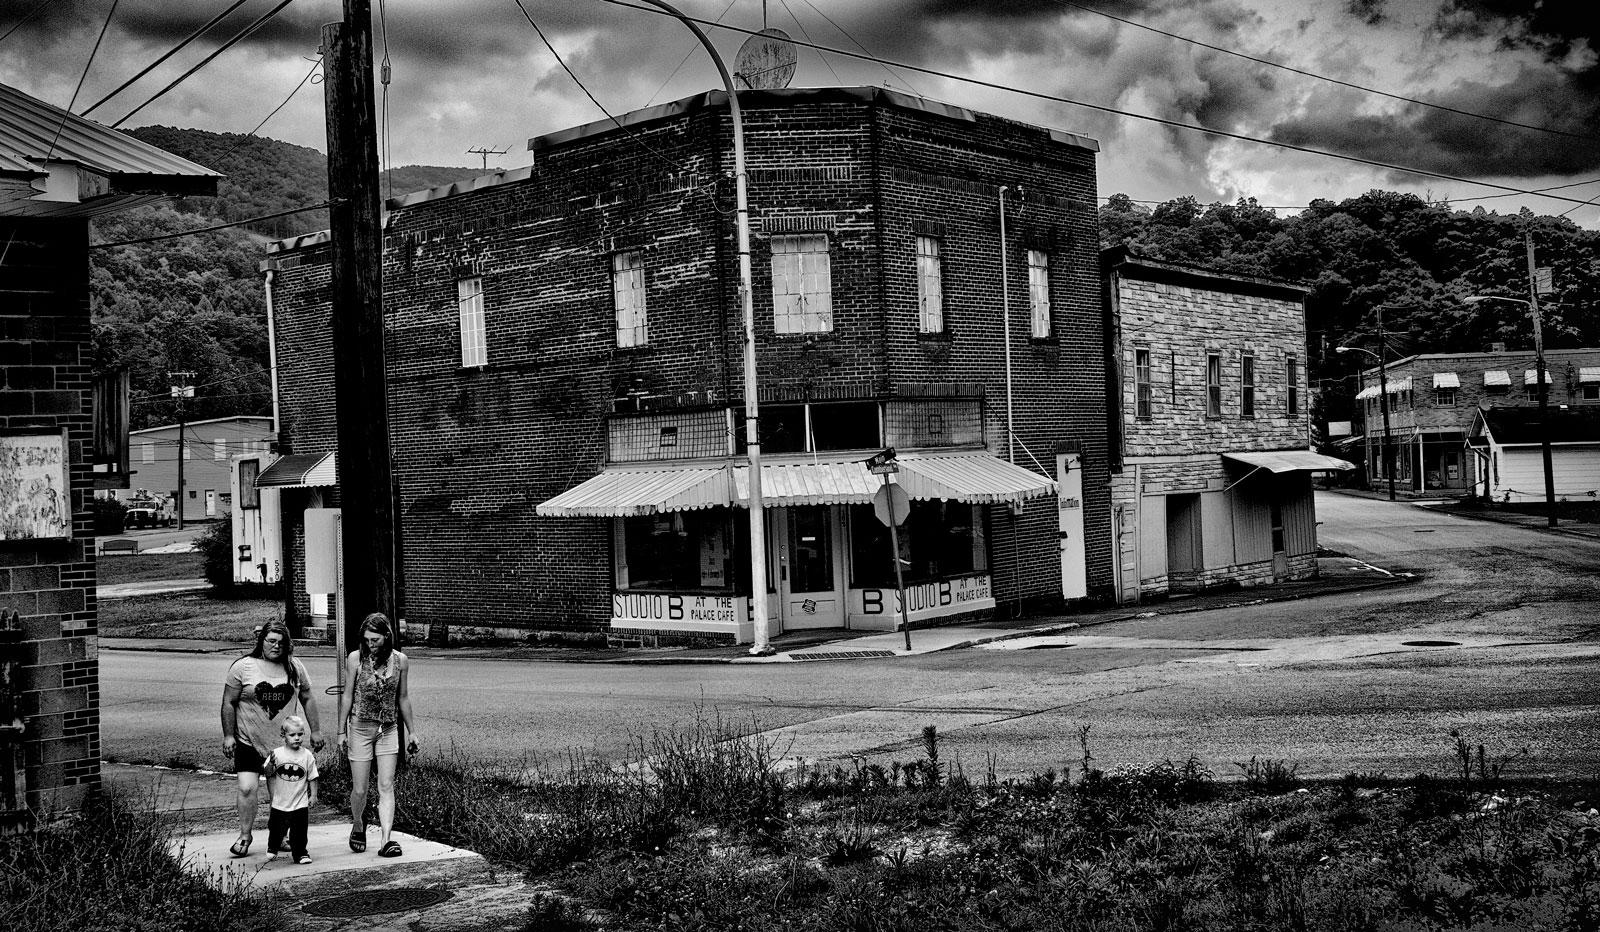 Harlan County, Cumberland, Kentucky, 2015